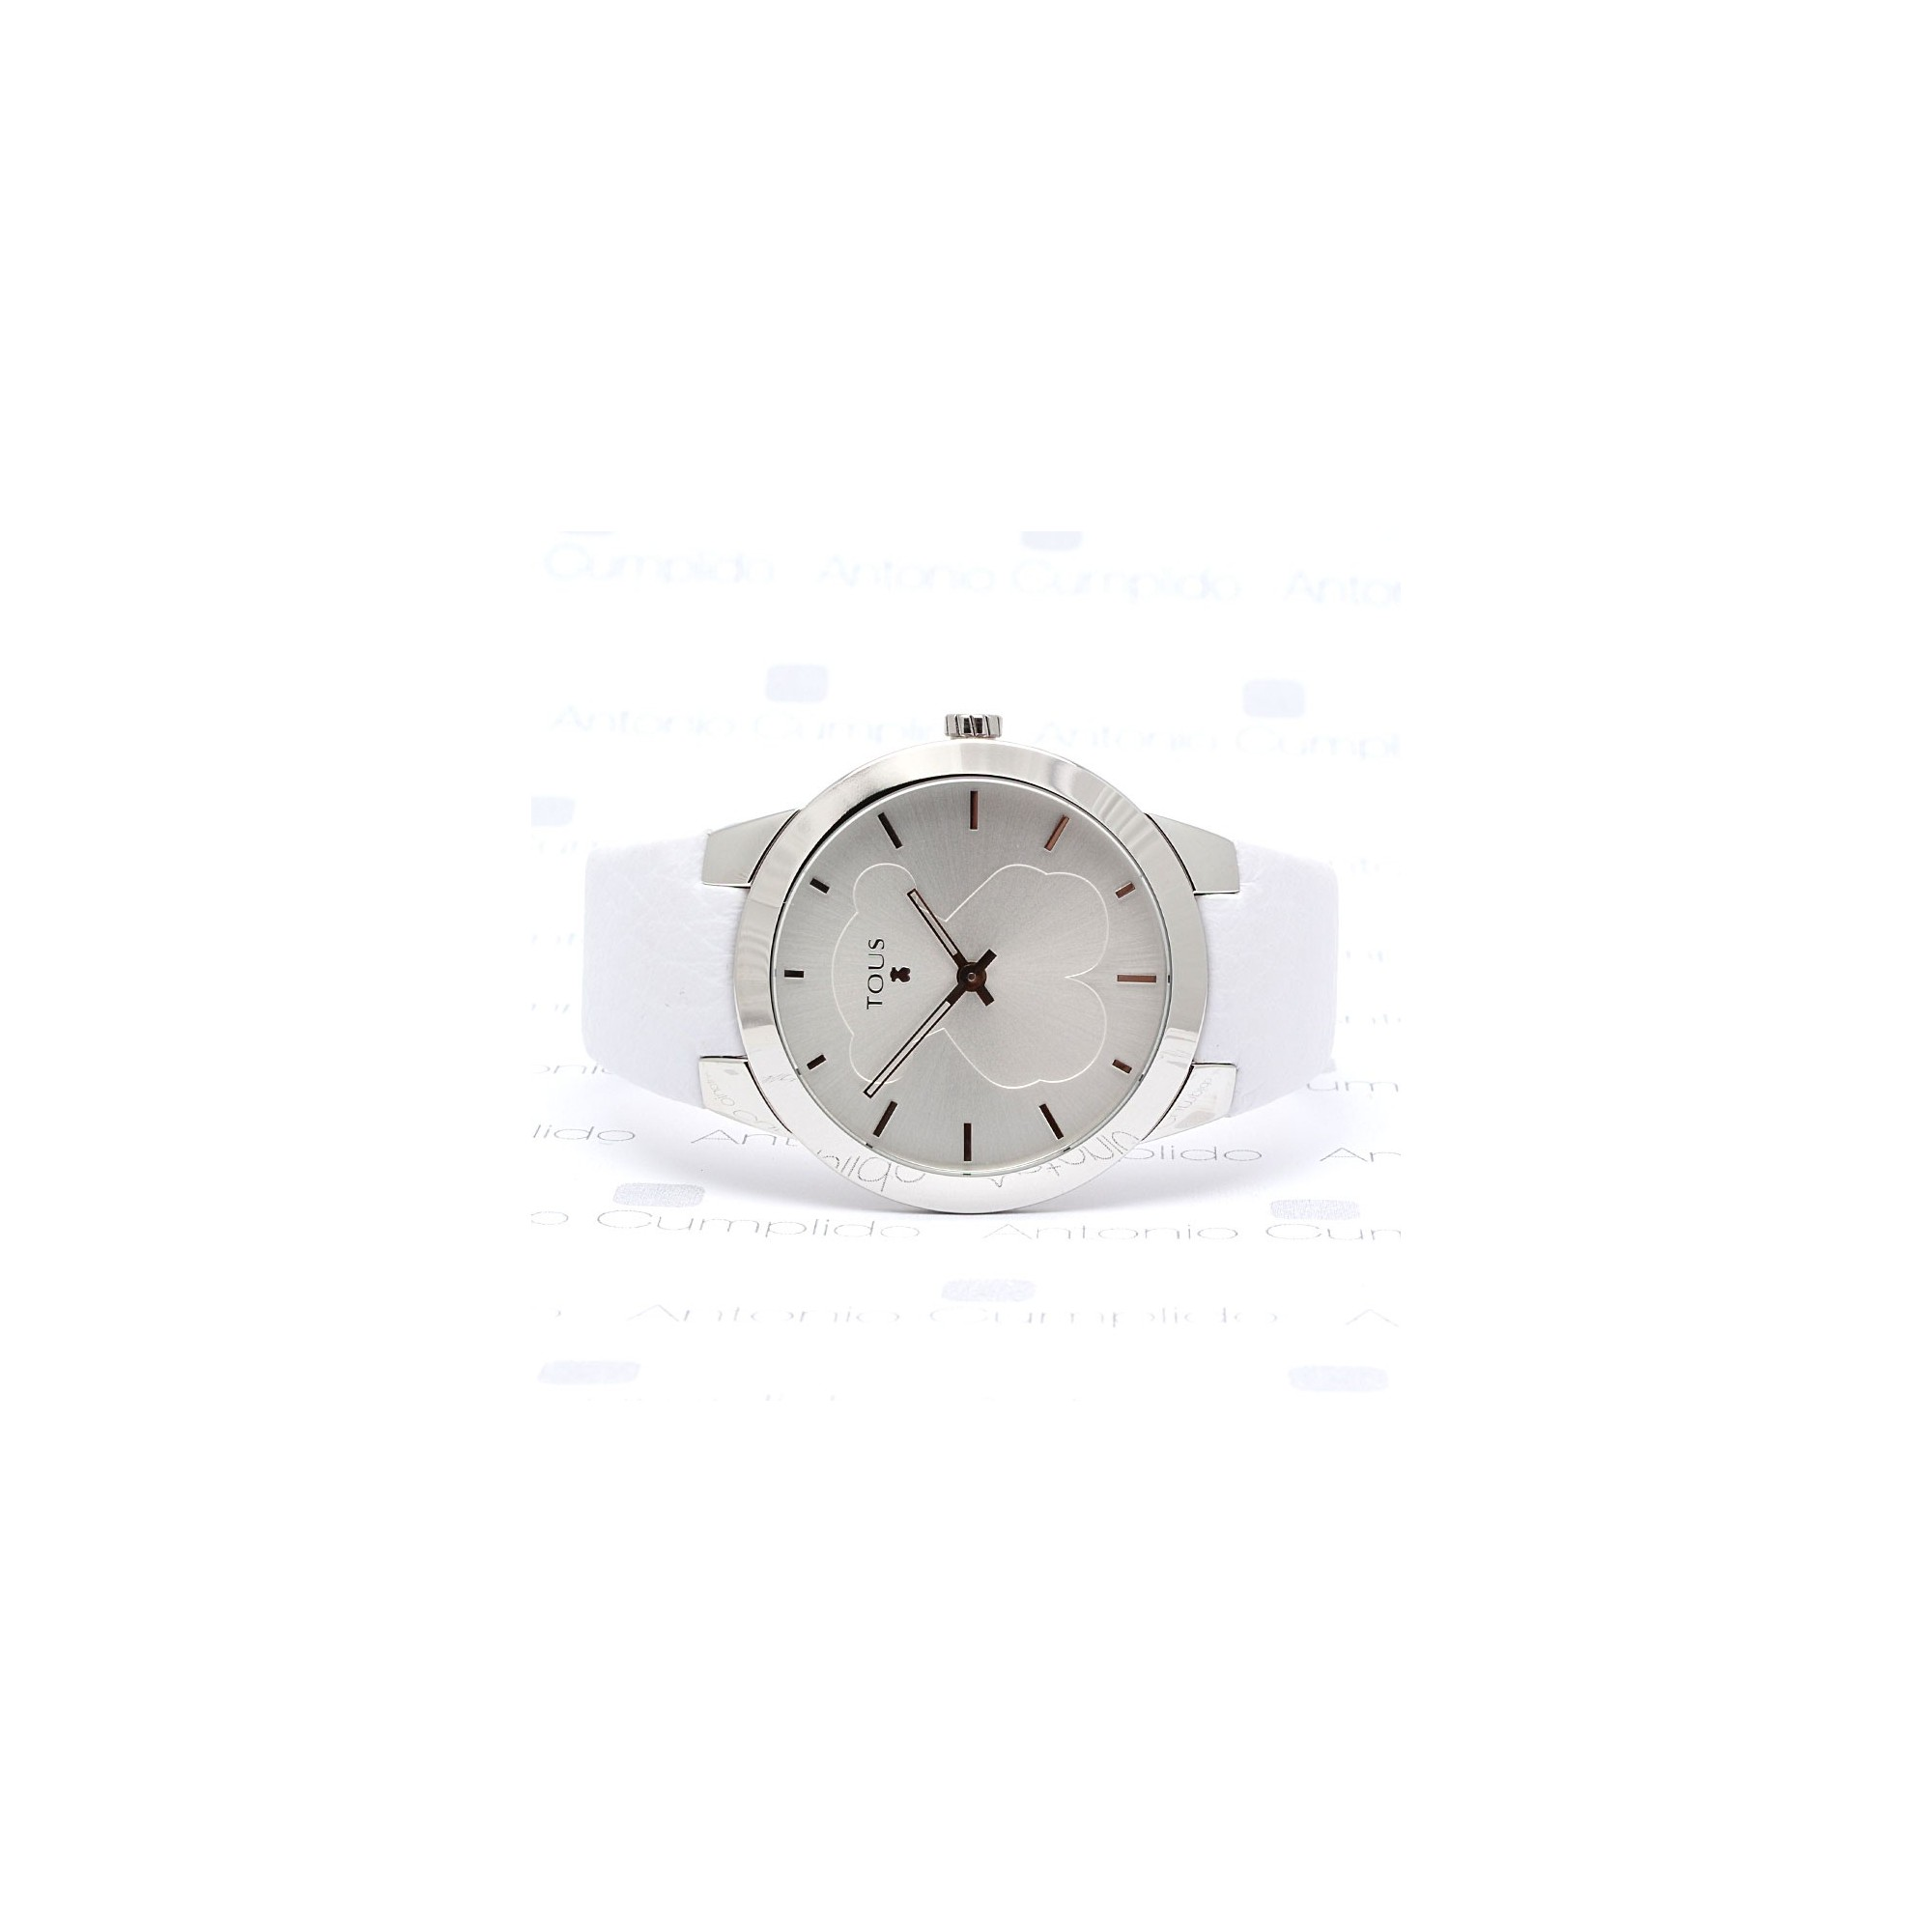 Reloj Tous Chica Acero Correa Blanca B-Face Ivory 400350115 870b9f06c628